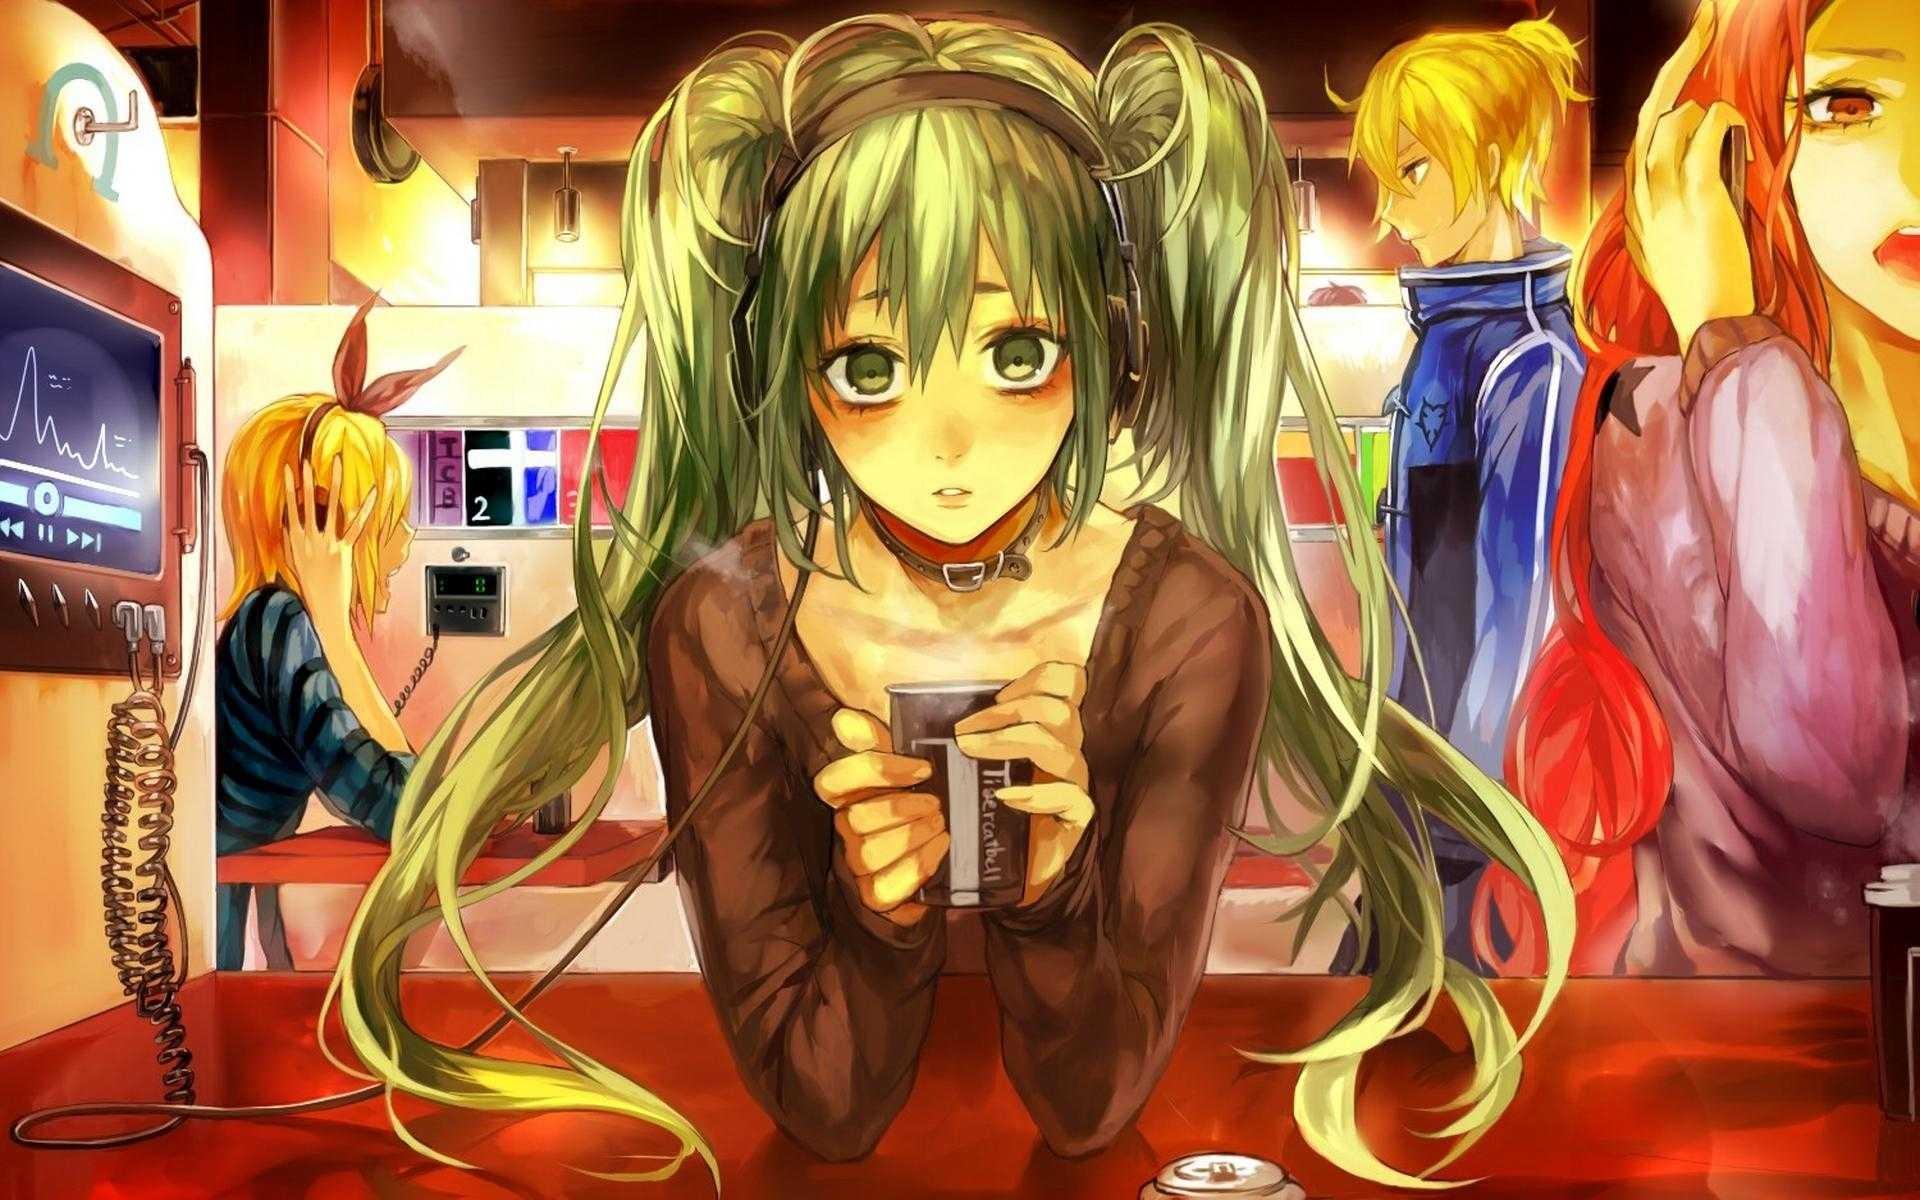 Wallpaper Illustration Anime Vocaloid Hatsune Miku